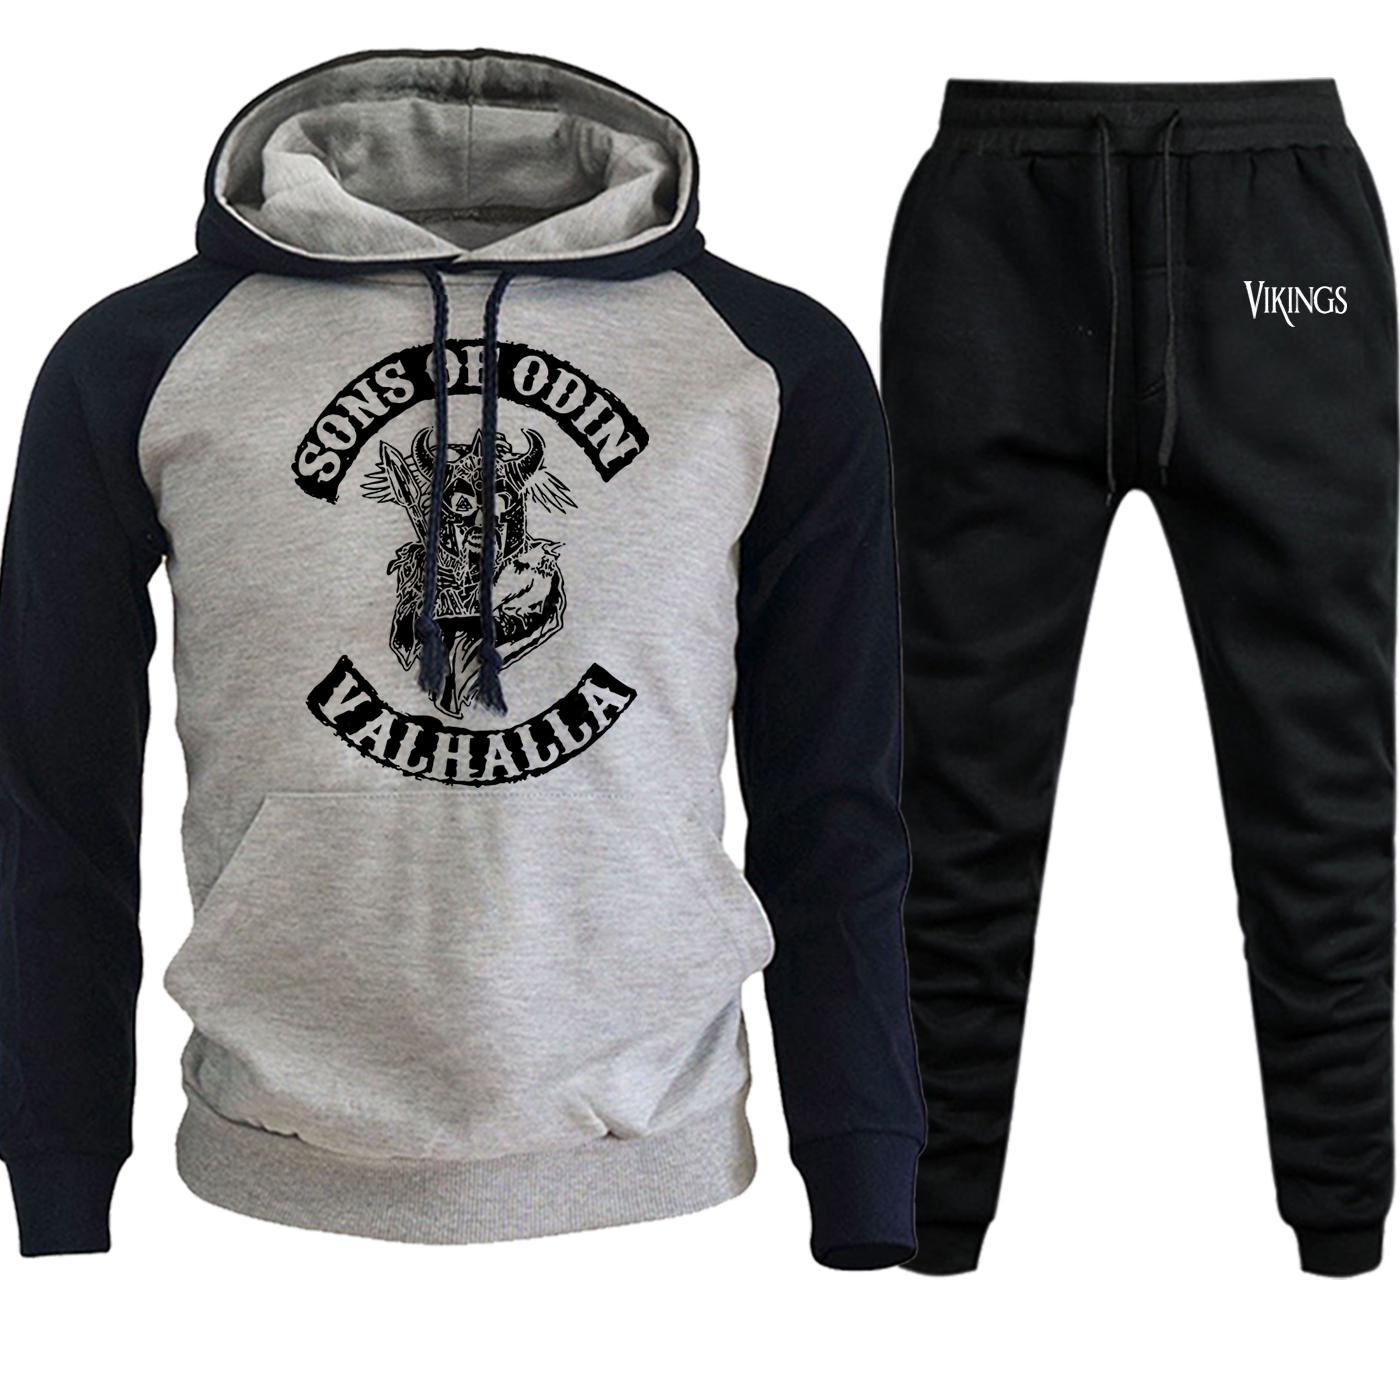 Vikings Streetwear Men Funny Raglan Hoodies Autumn Winter 2019 Suit Male Hip Hop Pullover Casual Fleece Hoody+Pants 2 Piece Set